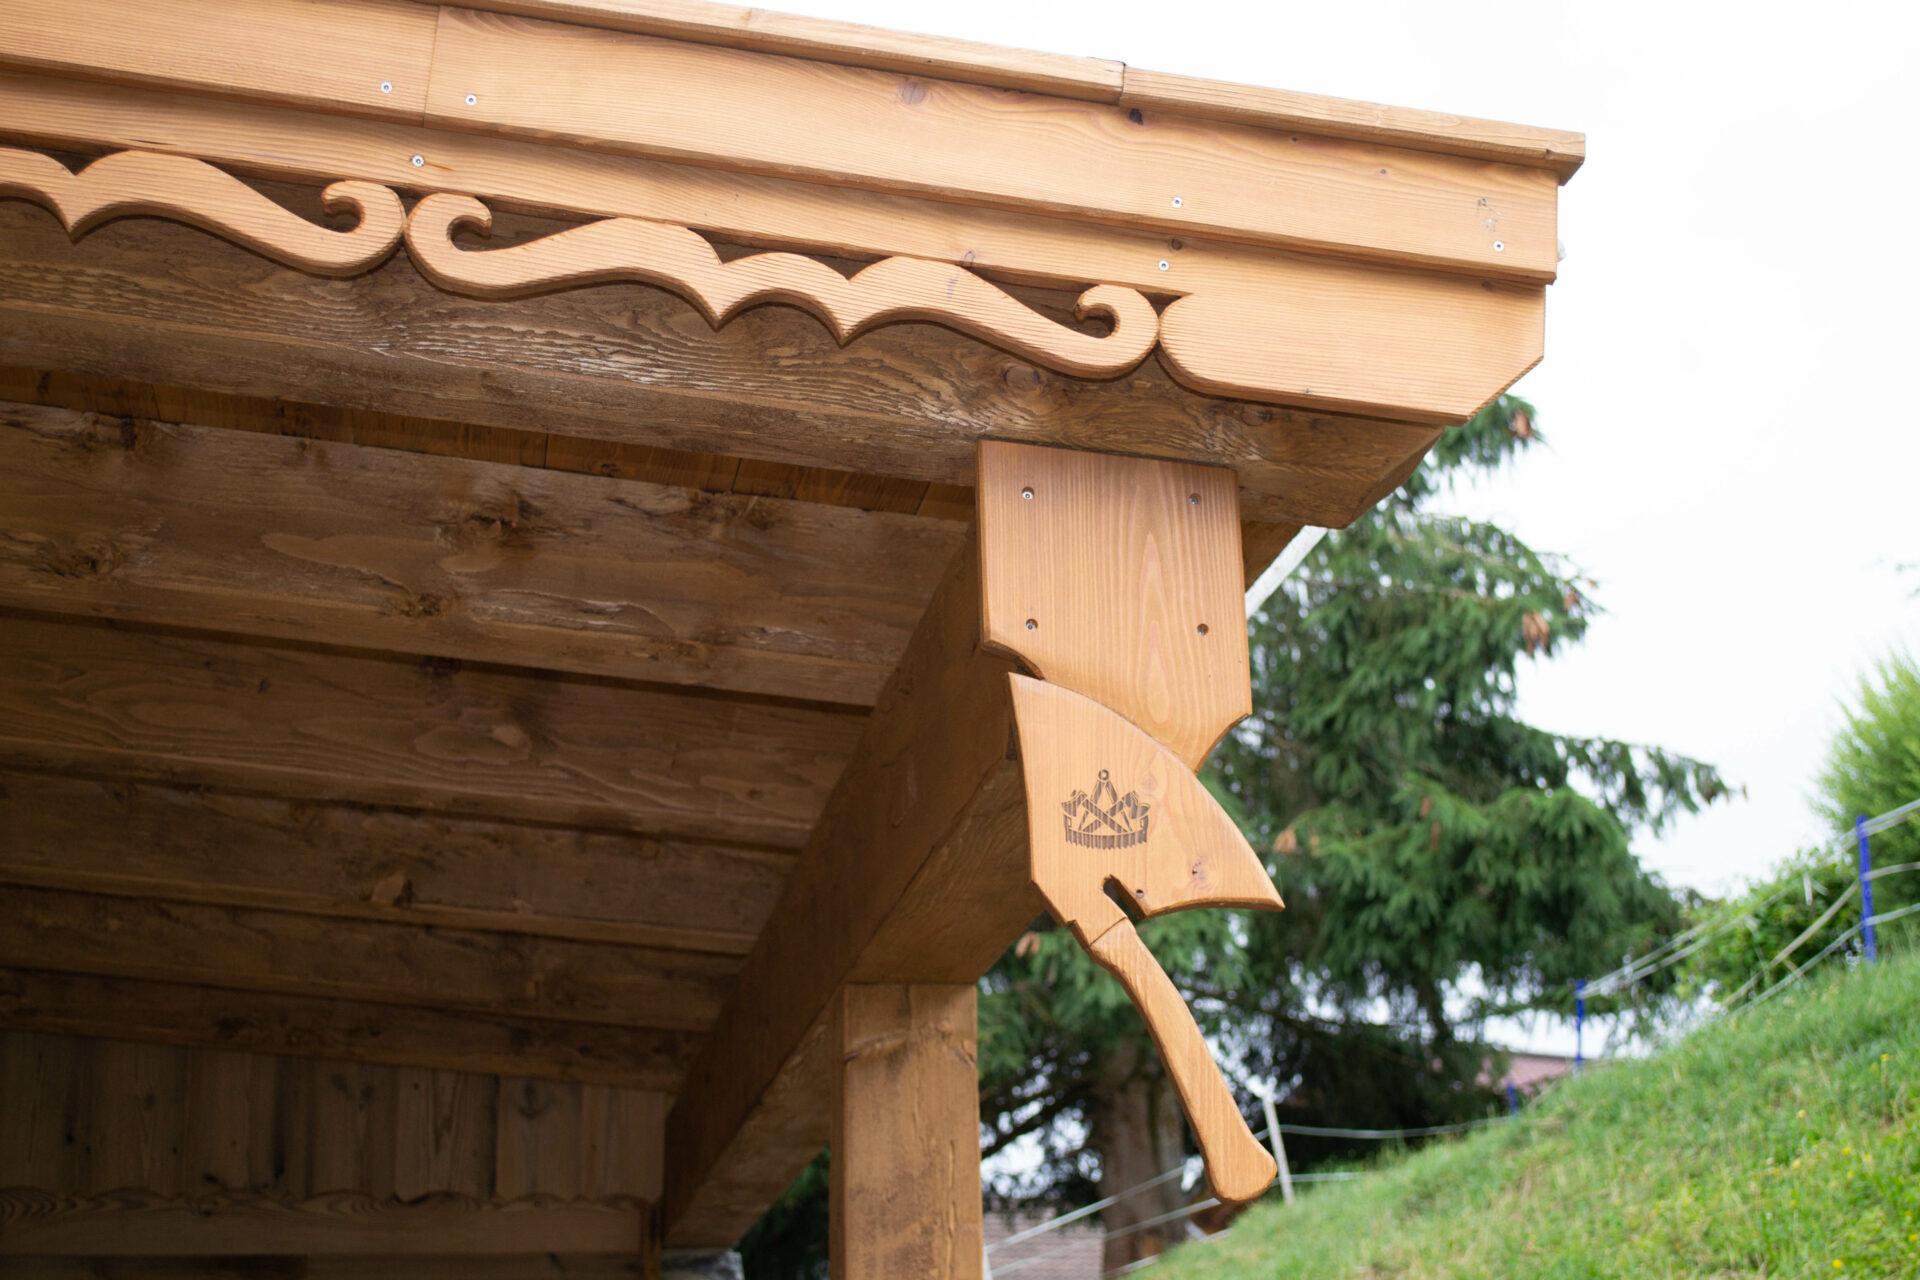 Holzkunst-Axt